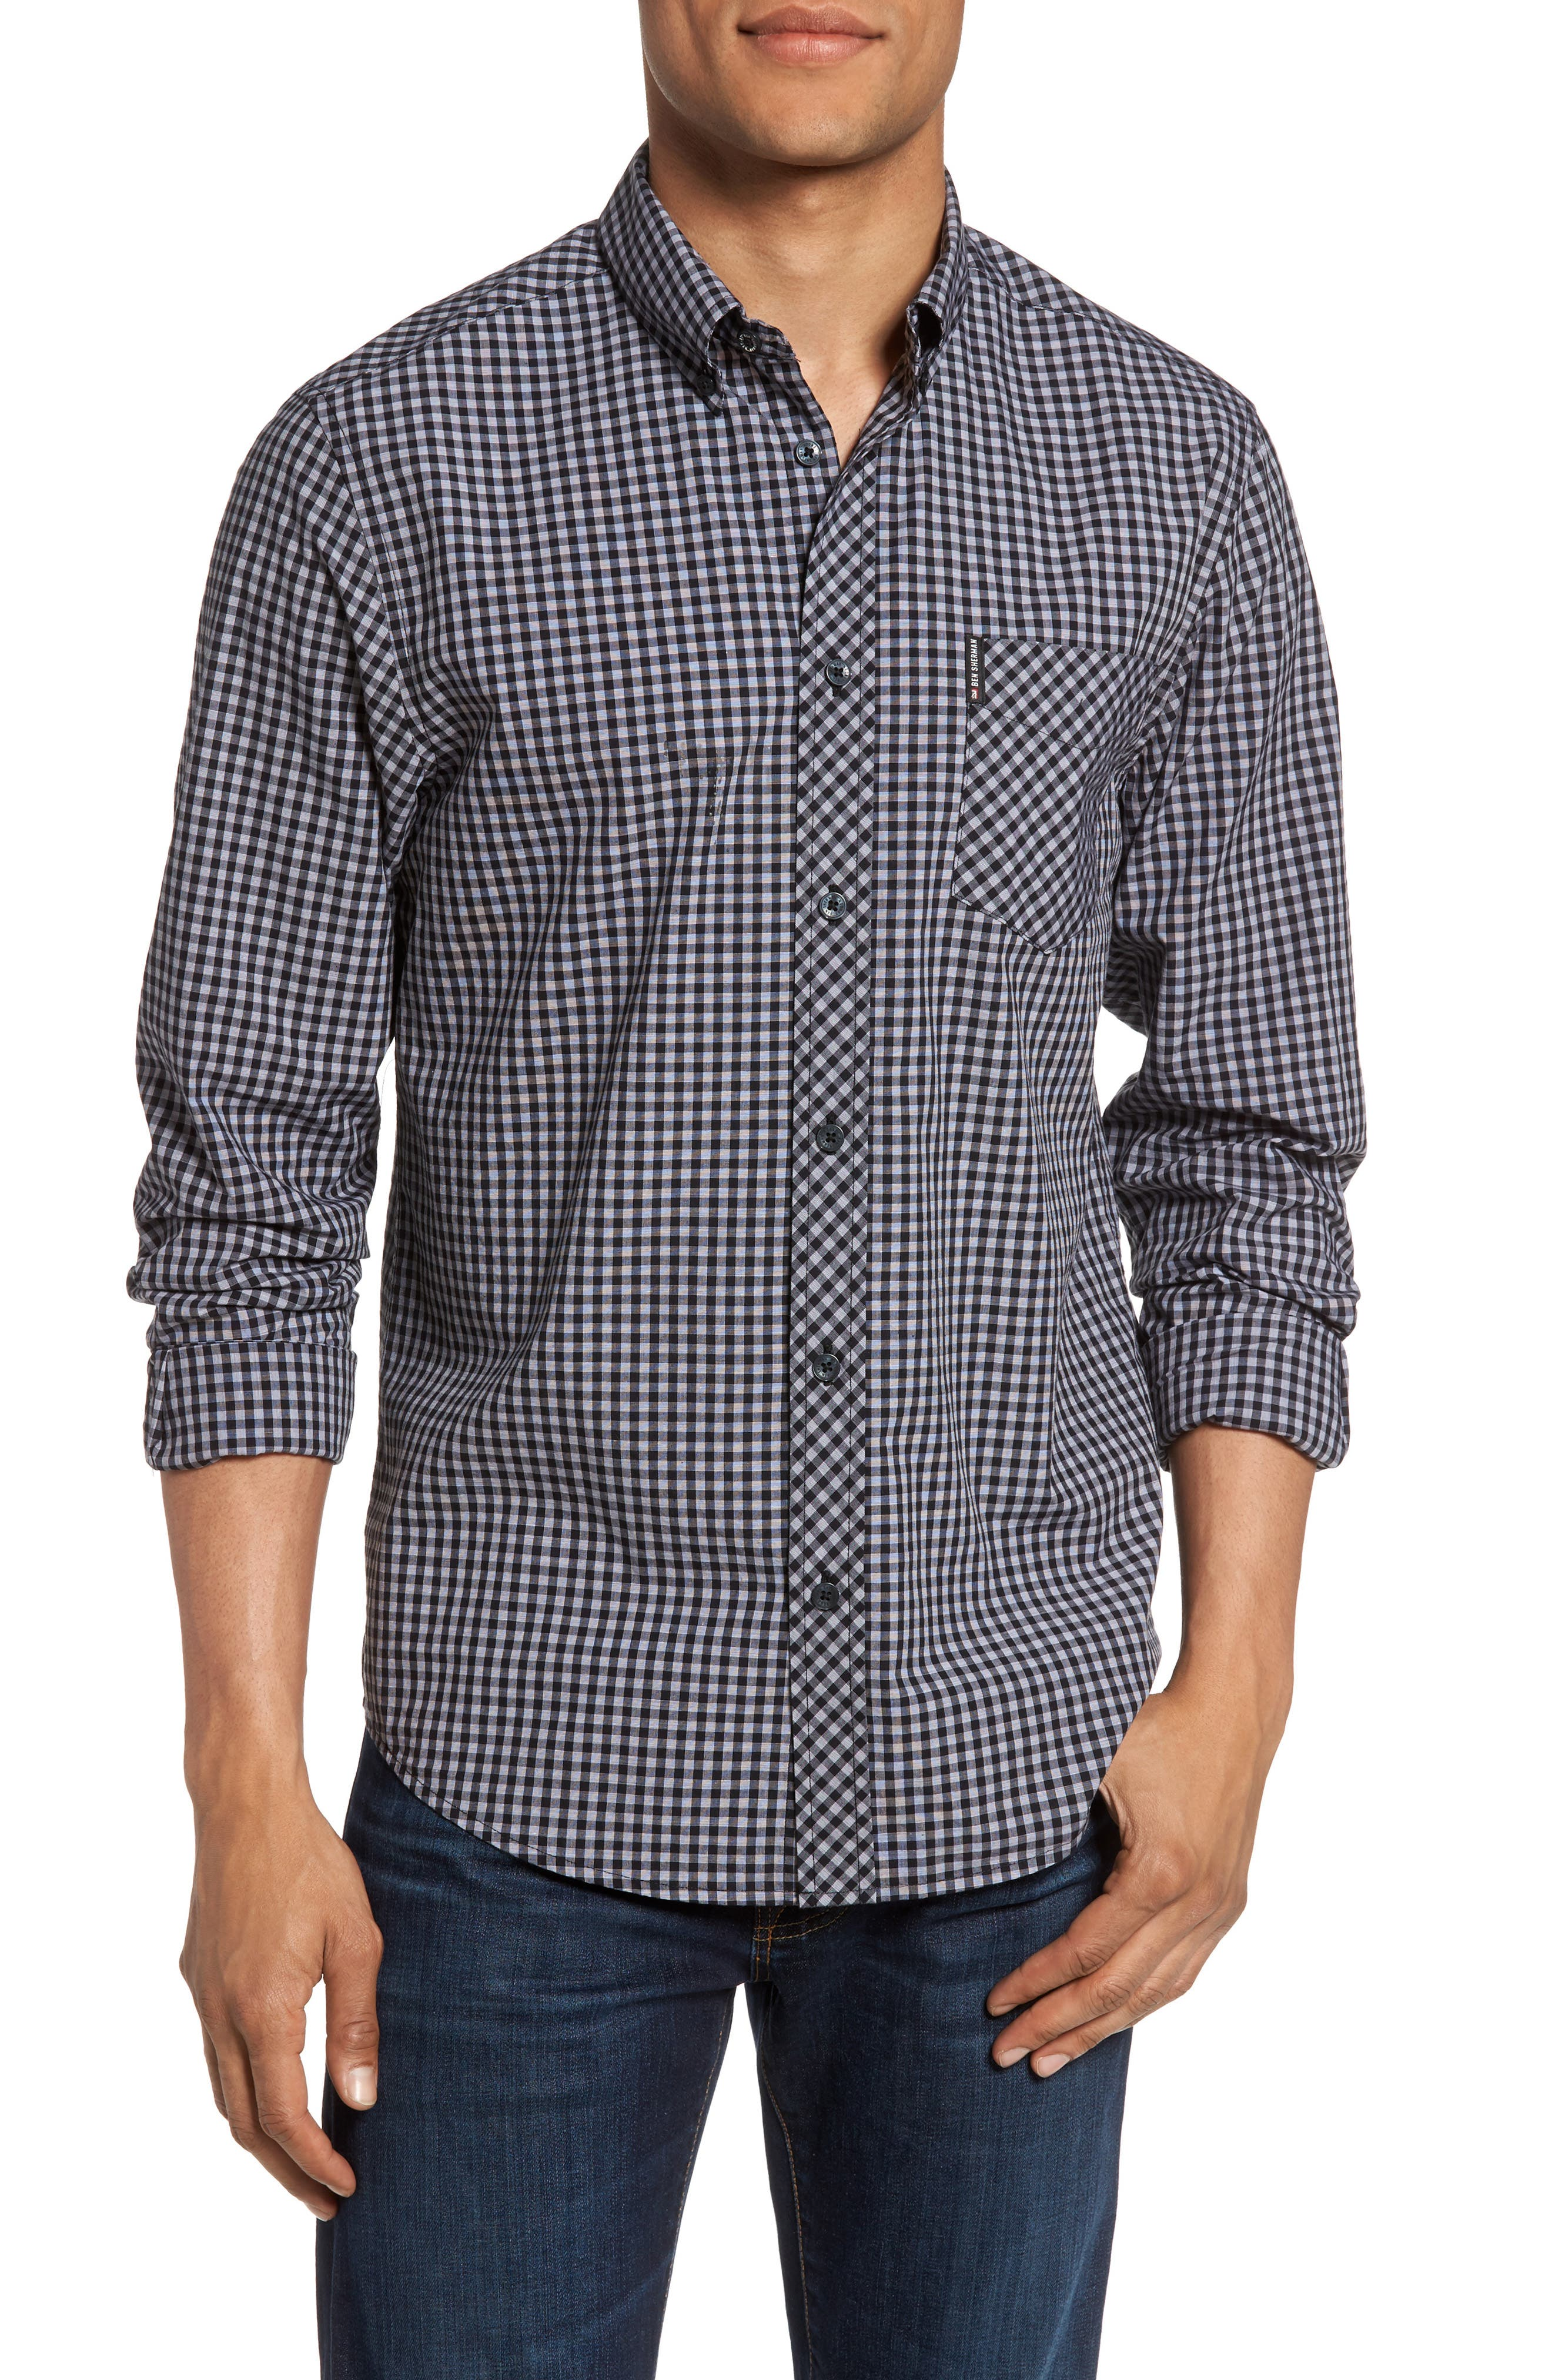 Ben Sherman Mod Fit Gingham Sport Shirt, Grey